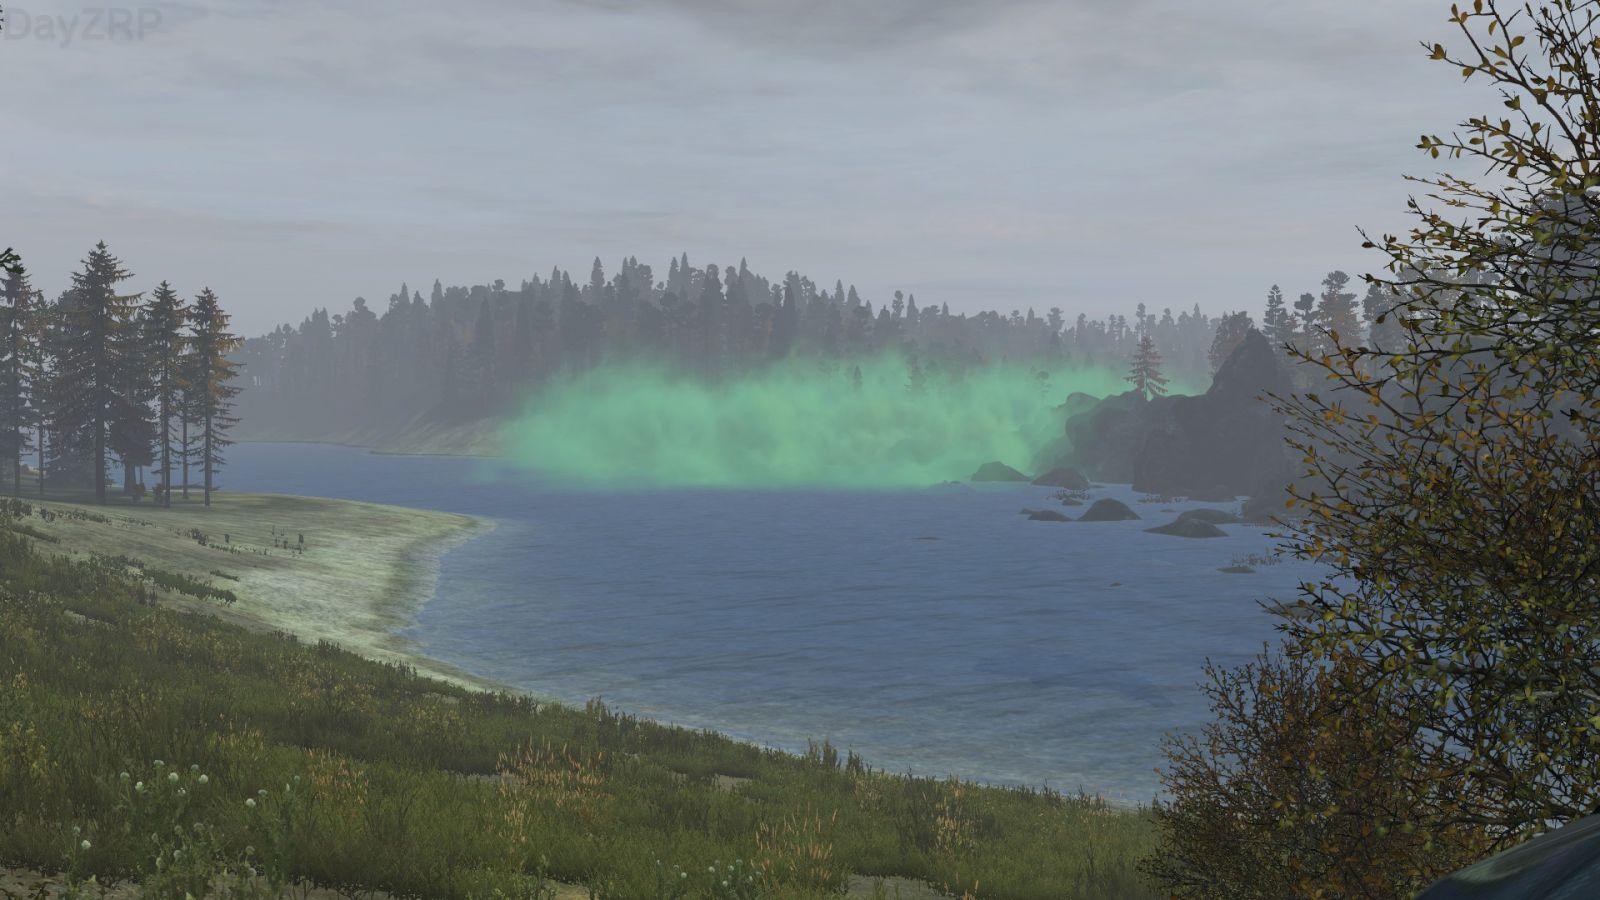 The green cloud?!